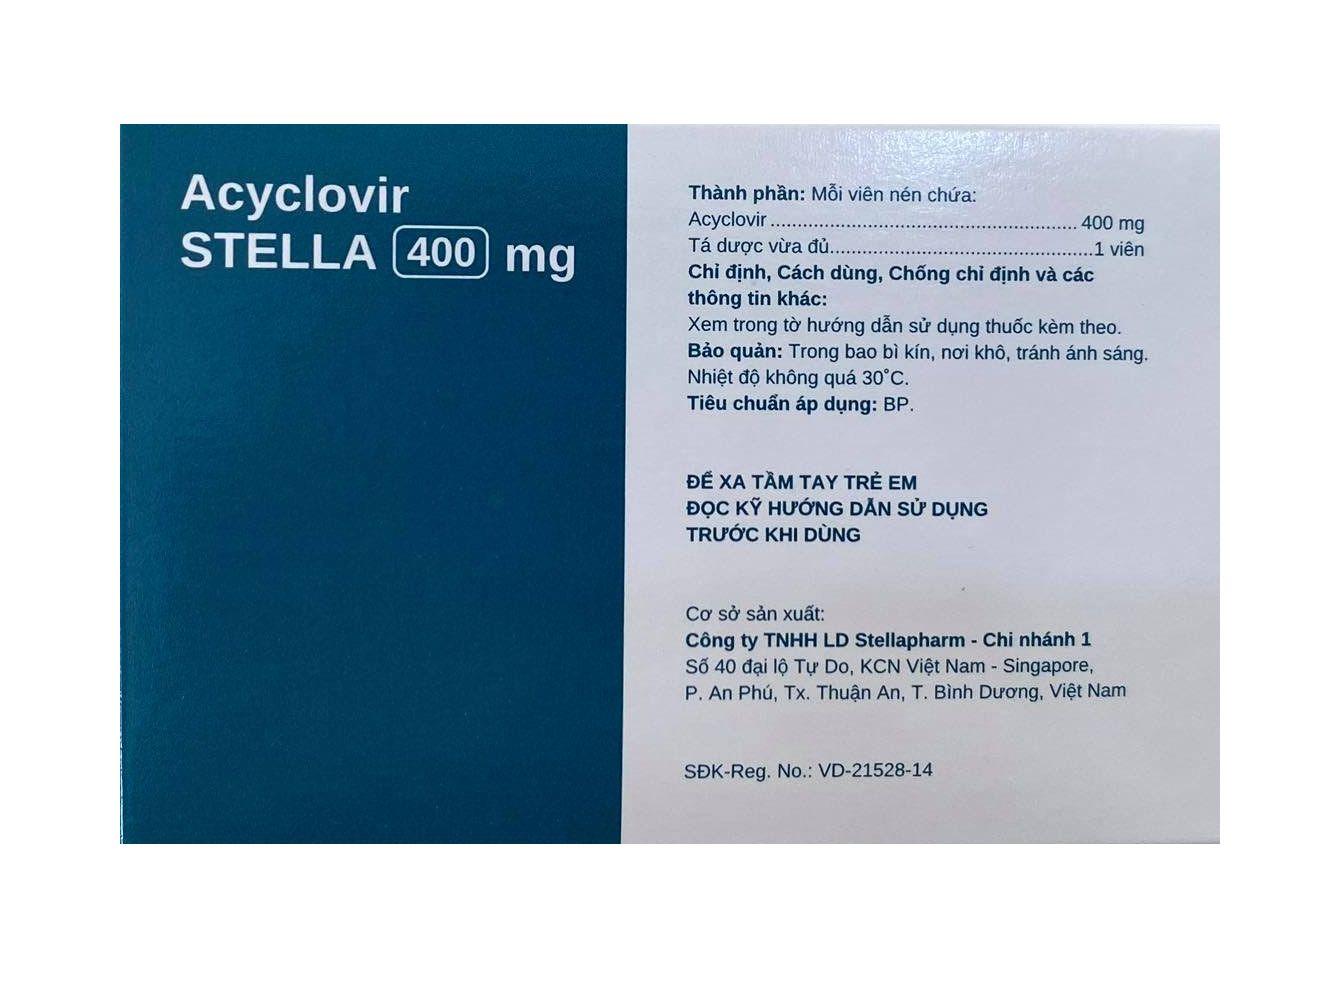 Acyclovir stada 400 mg, thành phần chínhAcyclovir